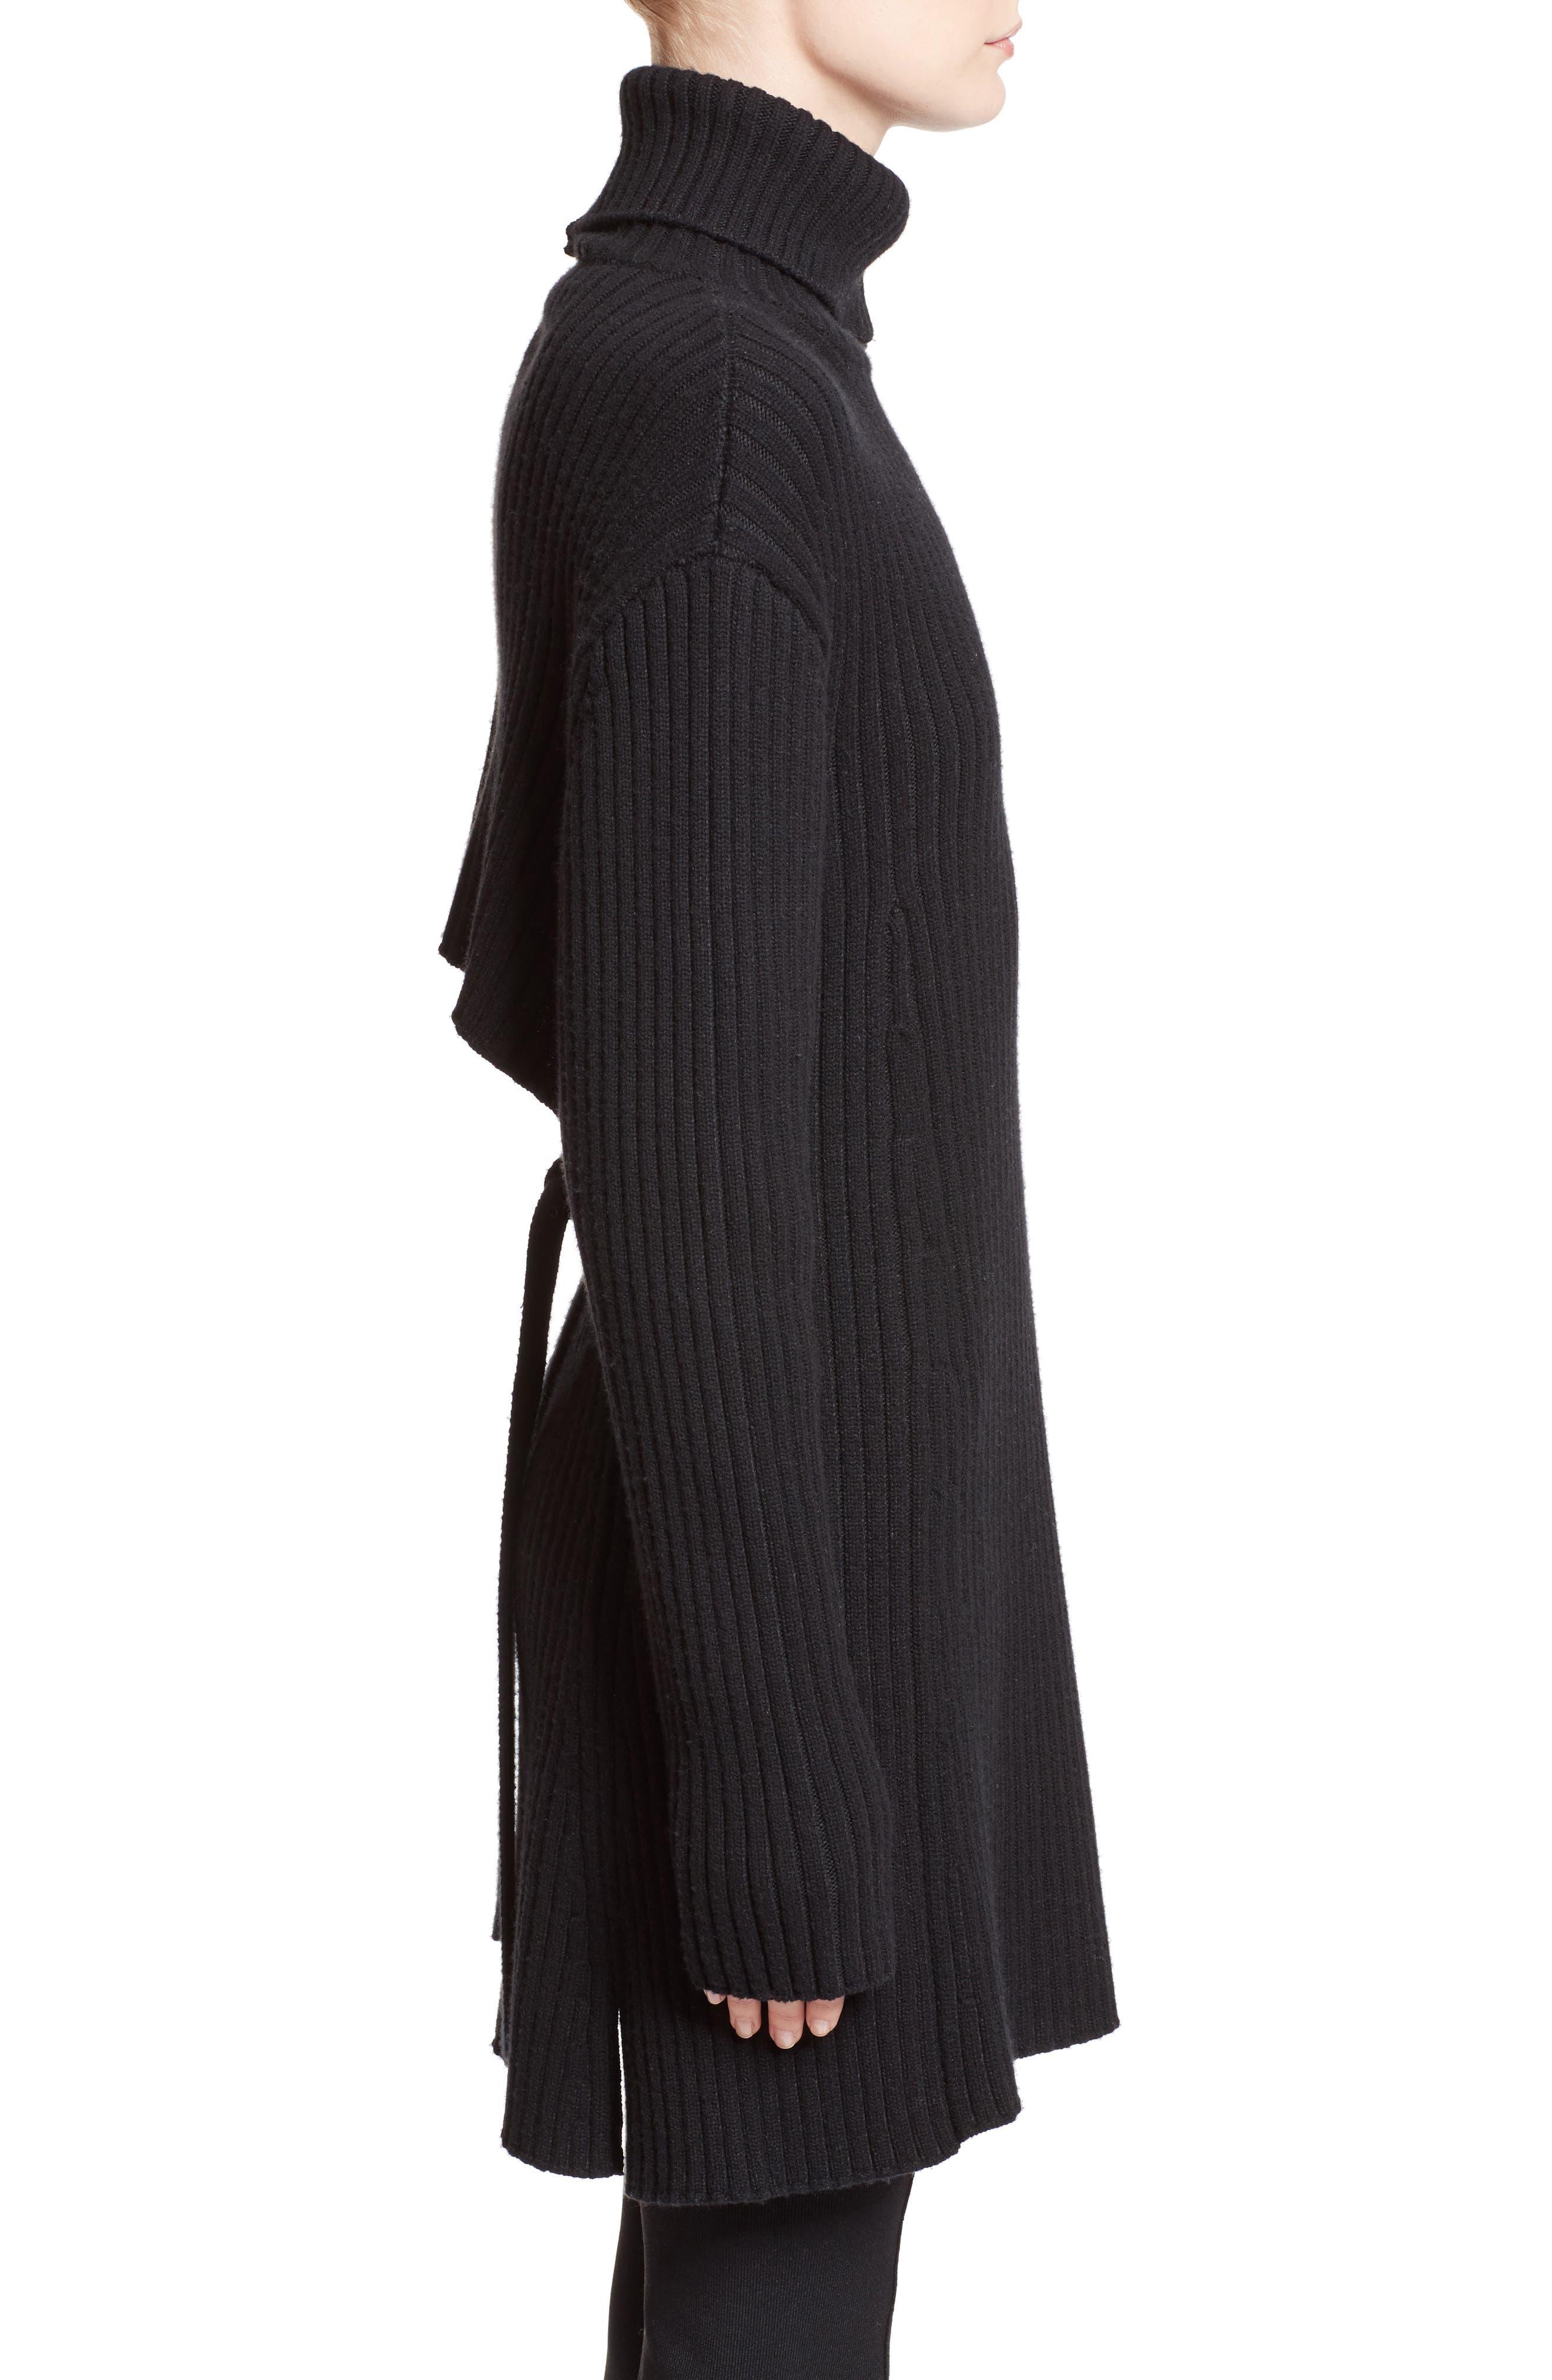 Wool & Cashmere Blend Turtleneck Dress,                             Alternate thumbnail 3, color,                             001